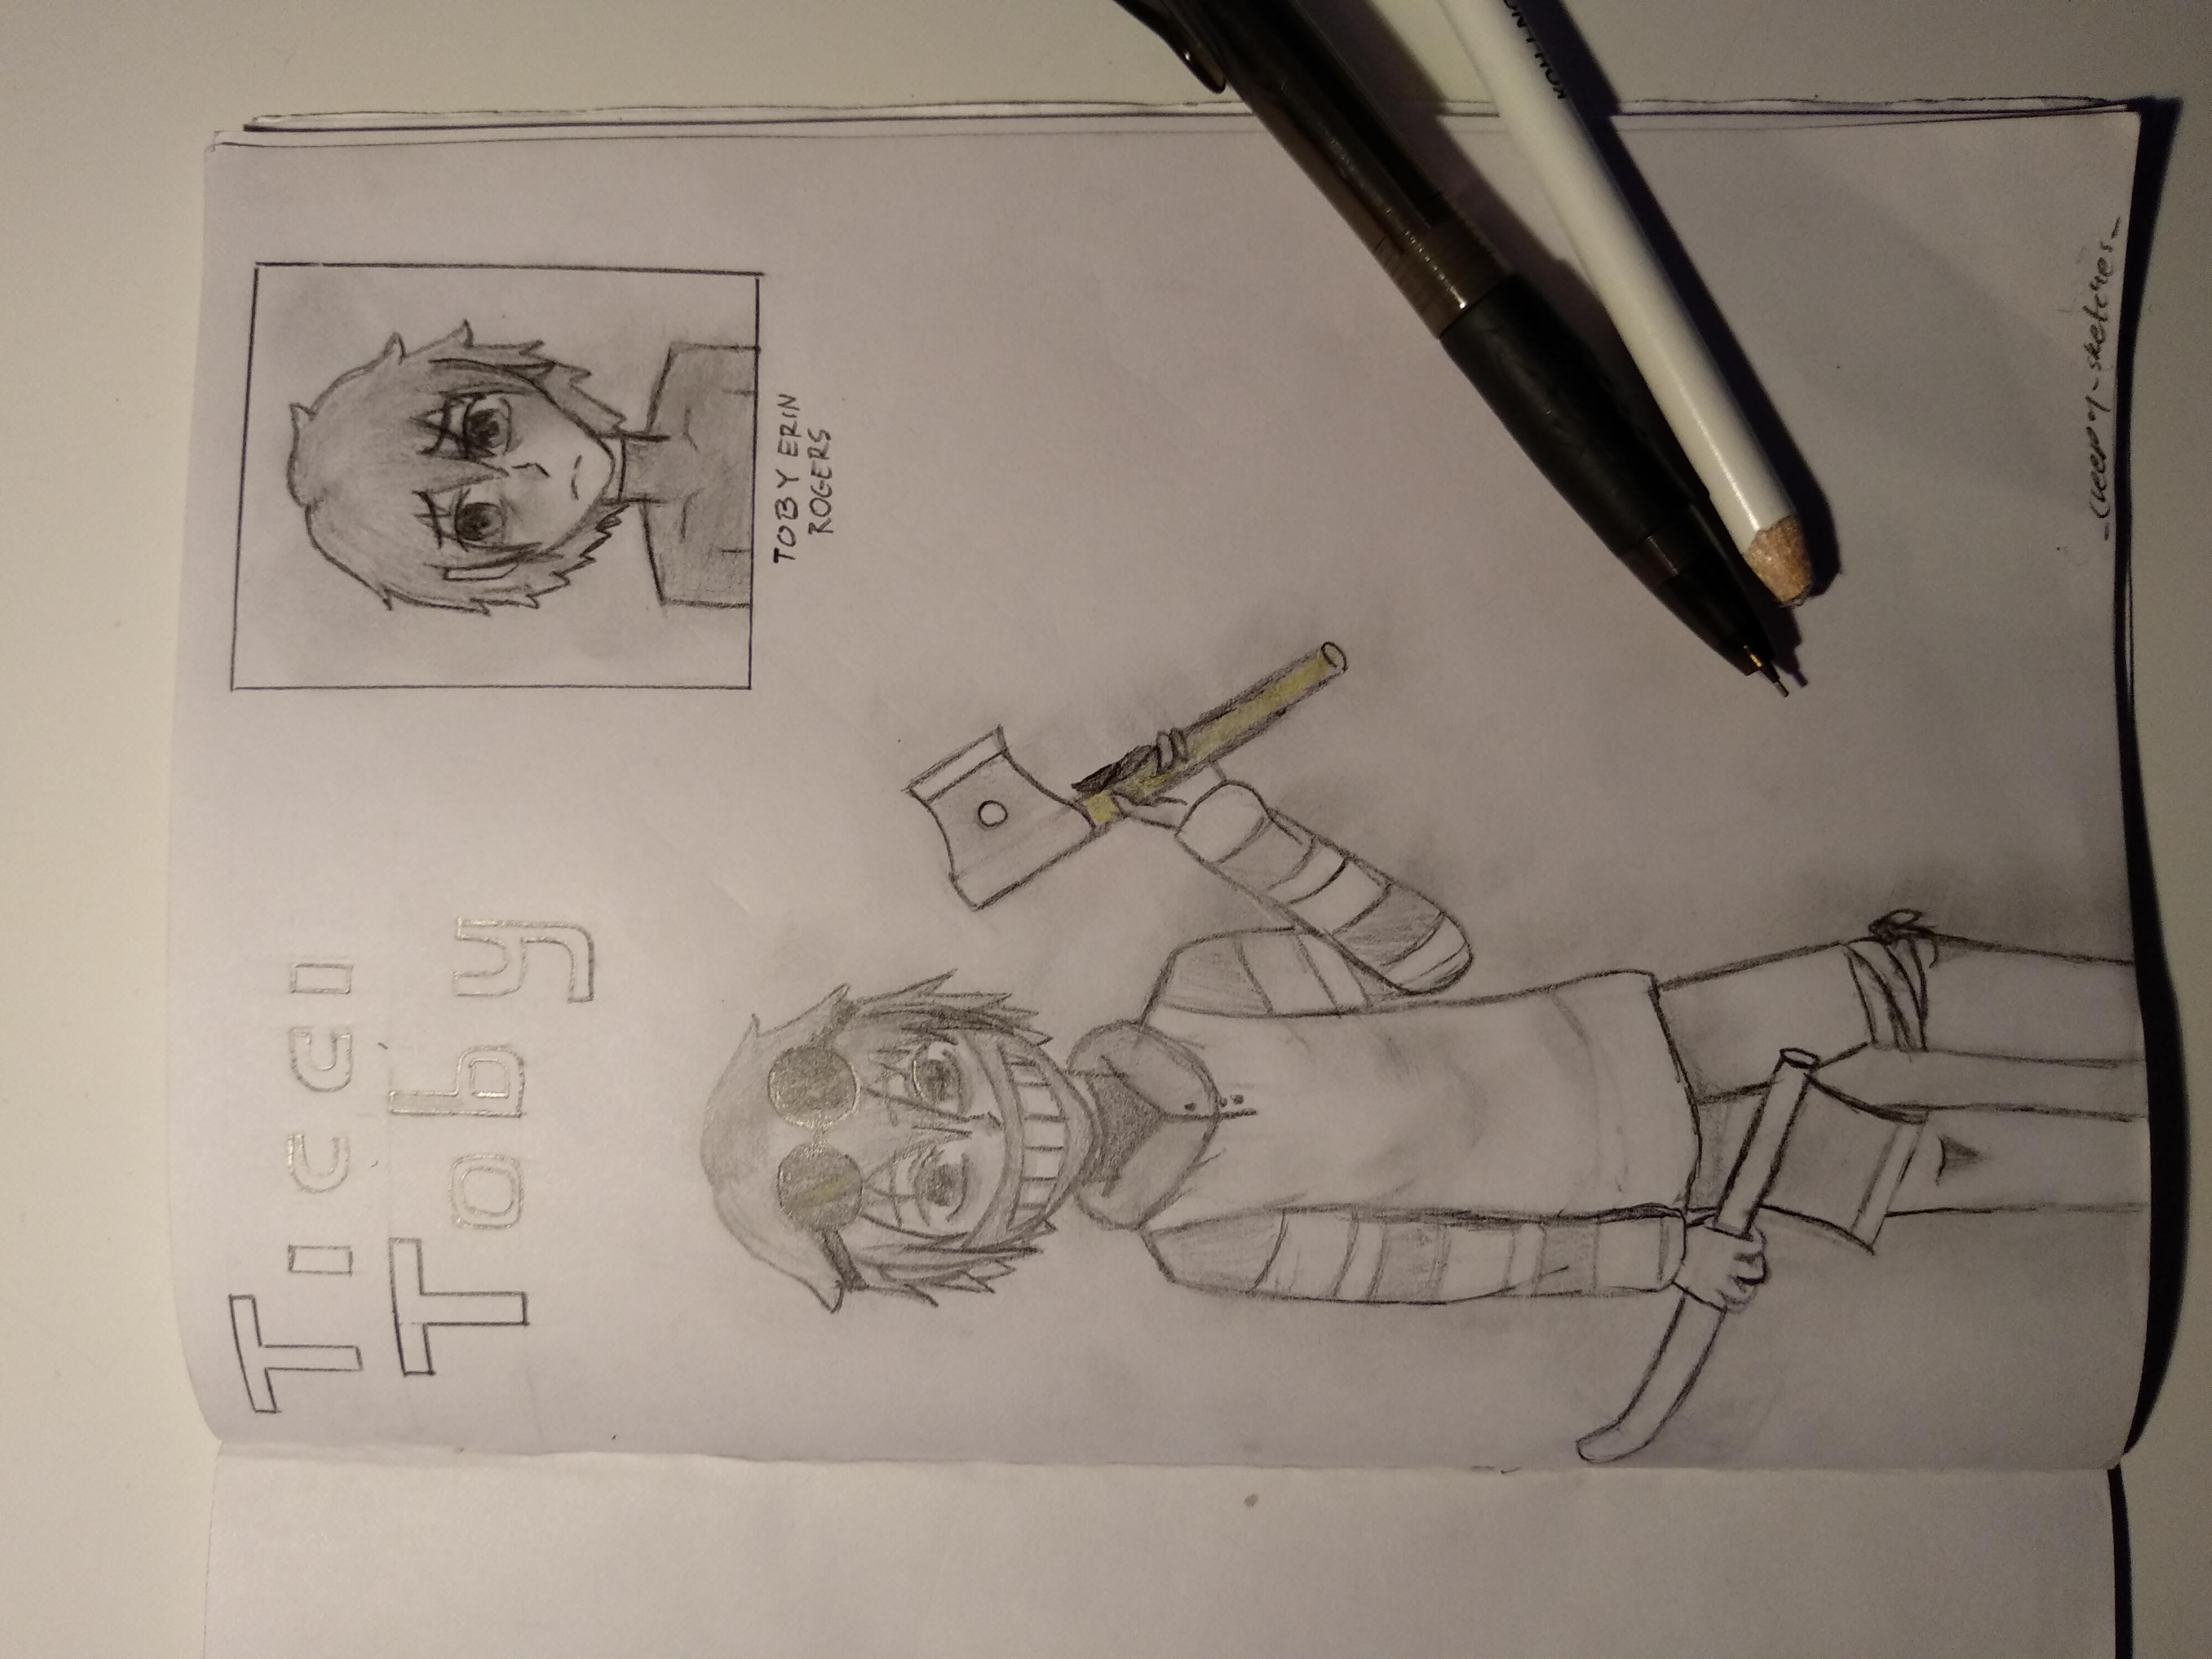 my sketch of ticci toby (he's my favorite Creepypasta btw) i drew him when i was in school 👌